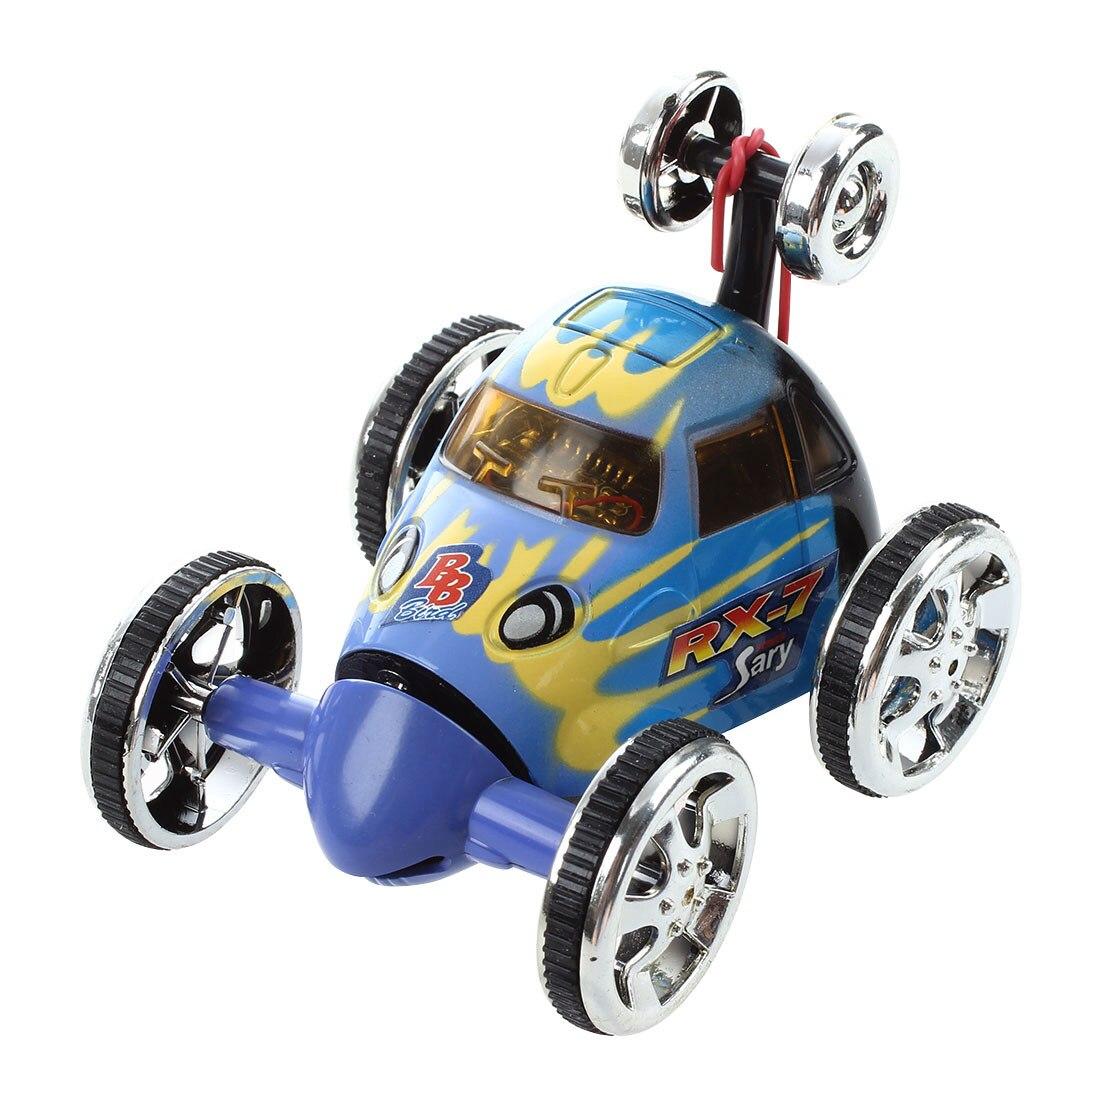 Mini Led RC 360 degree Wheelie Remote Control Stunt Car Toy Birthday Christmas Gift, Blue